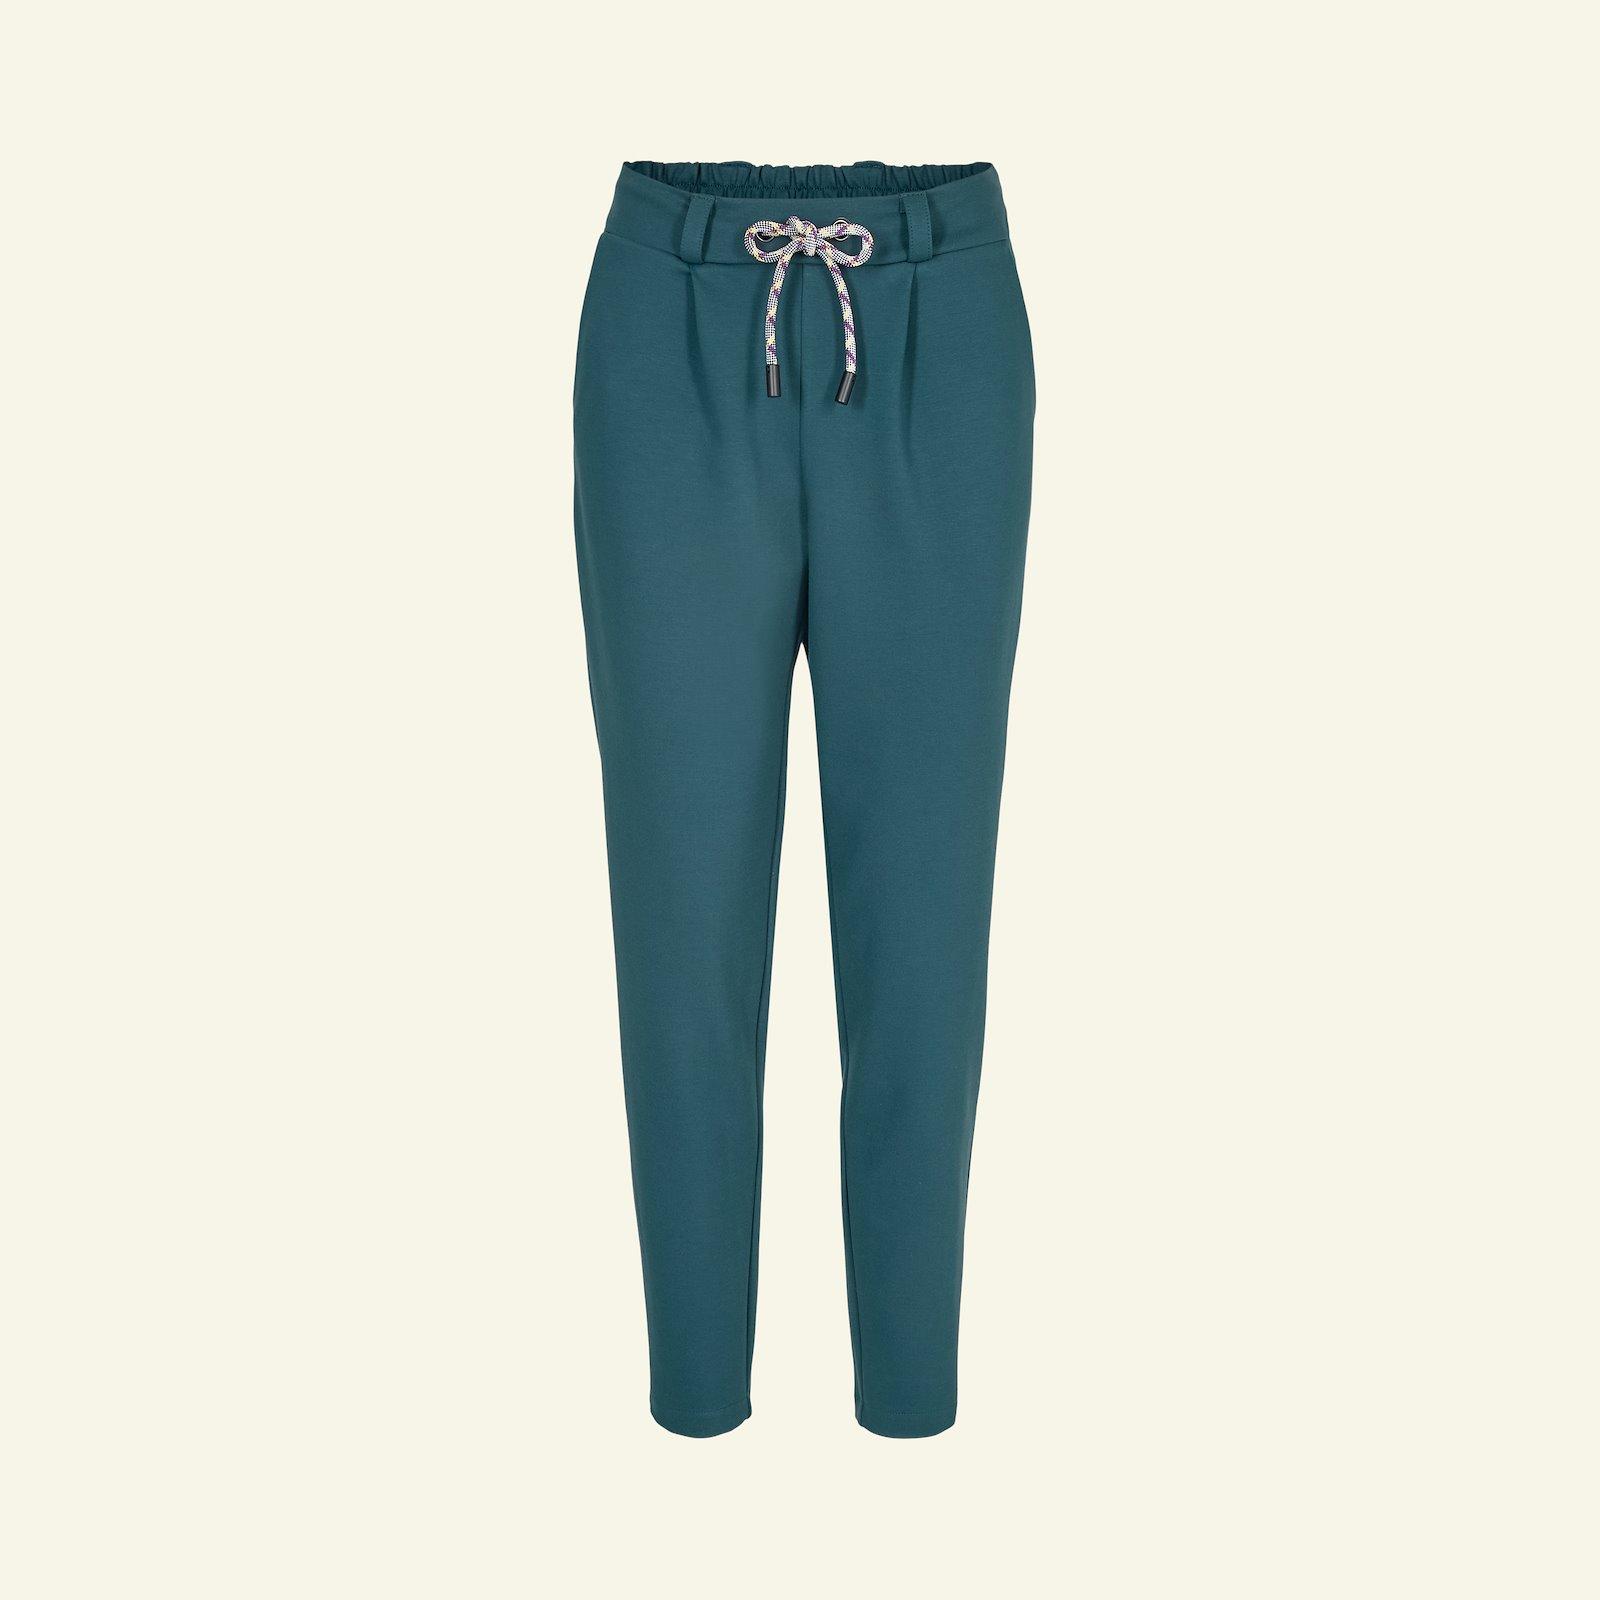 Trousers, 46/18 p20050_211748_75202_43702_45052_sskit